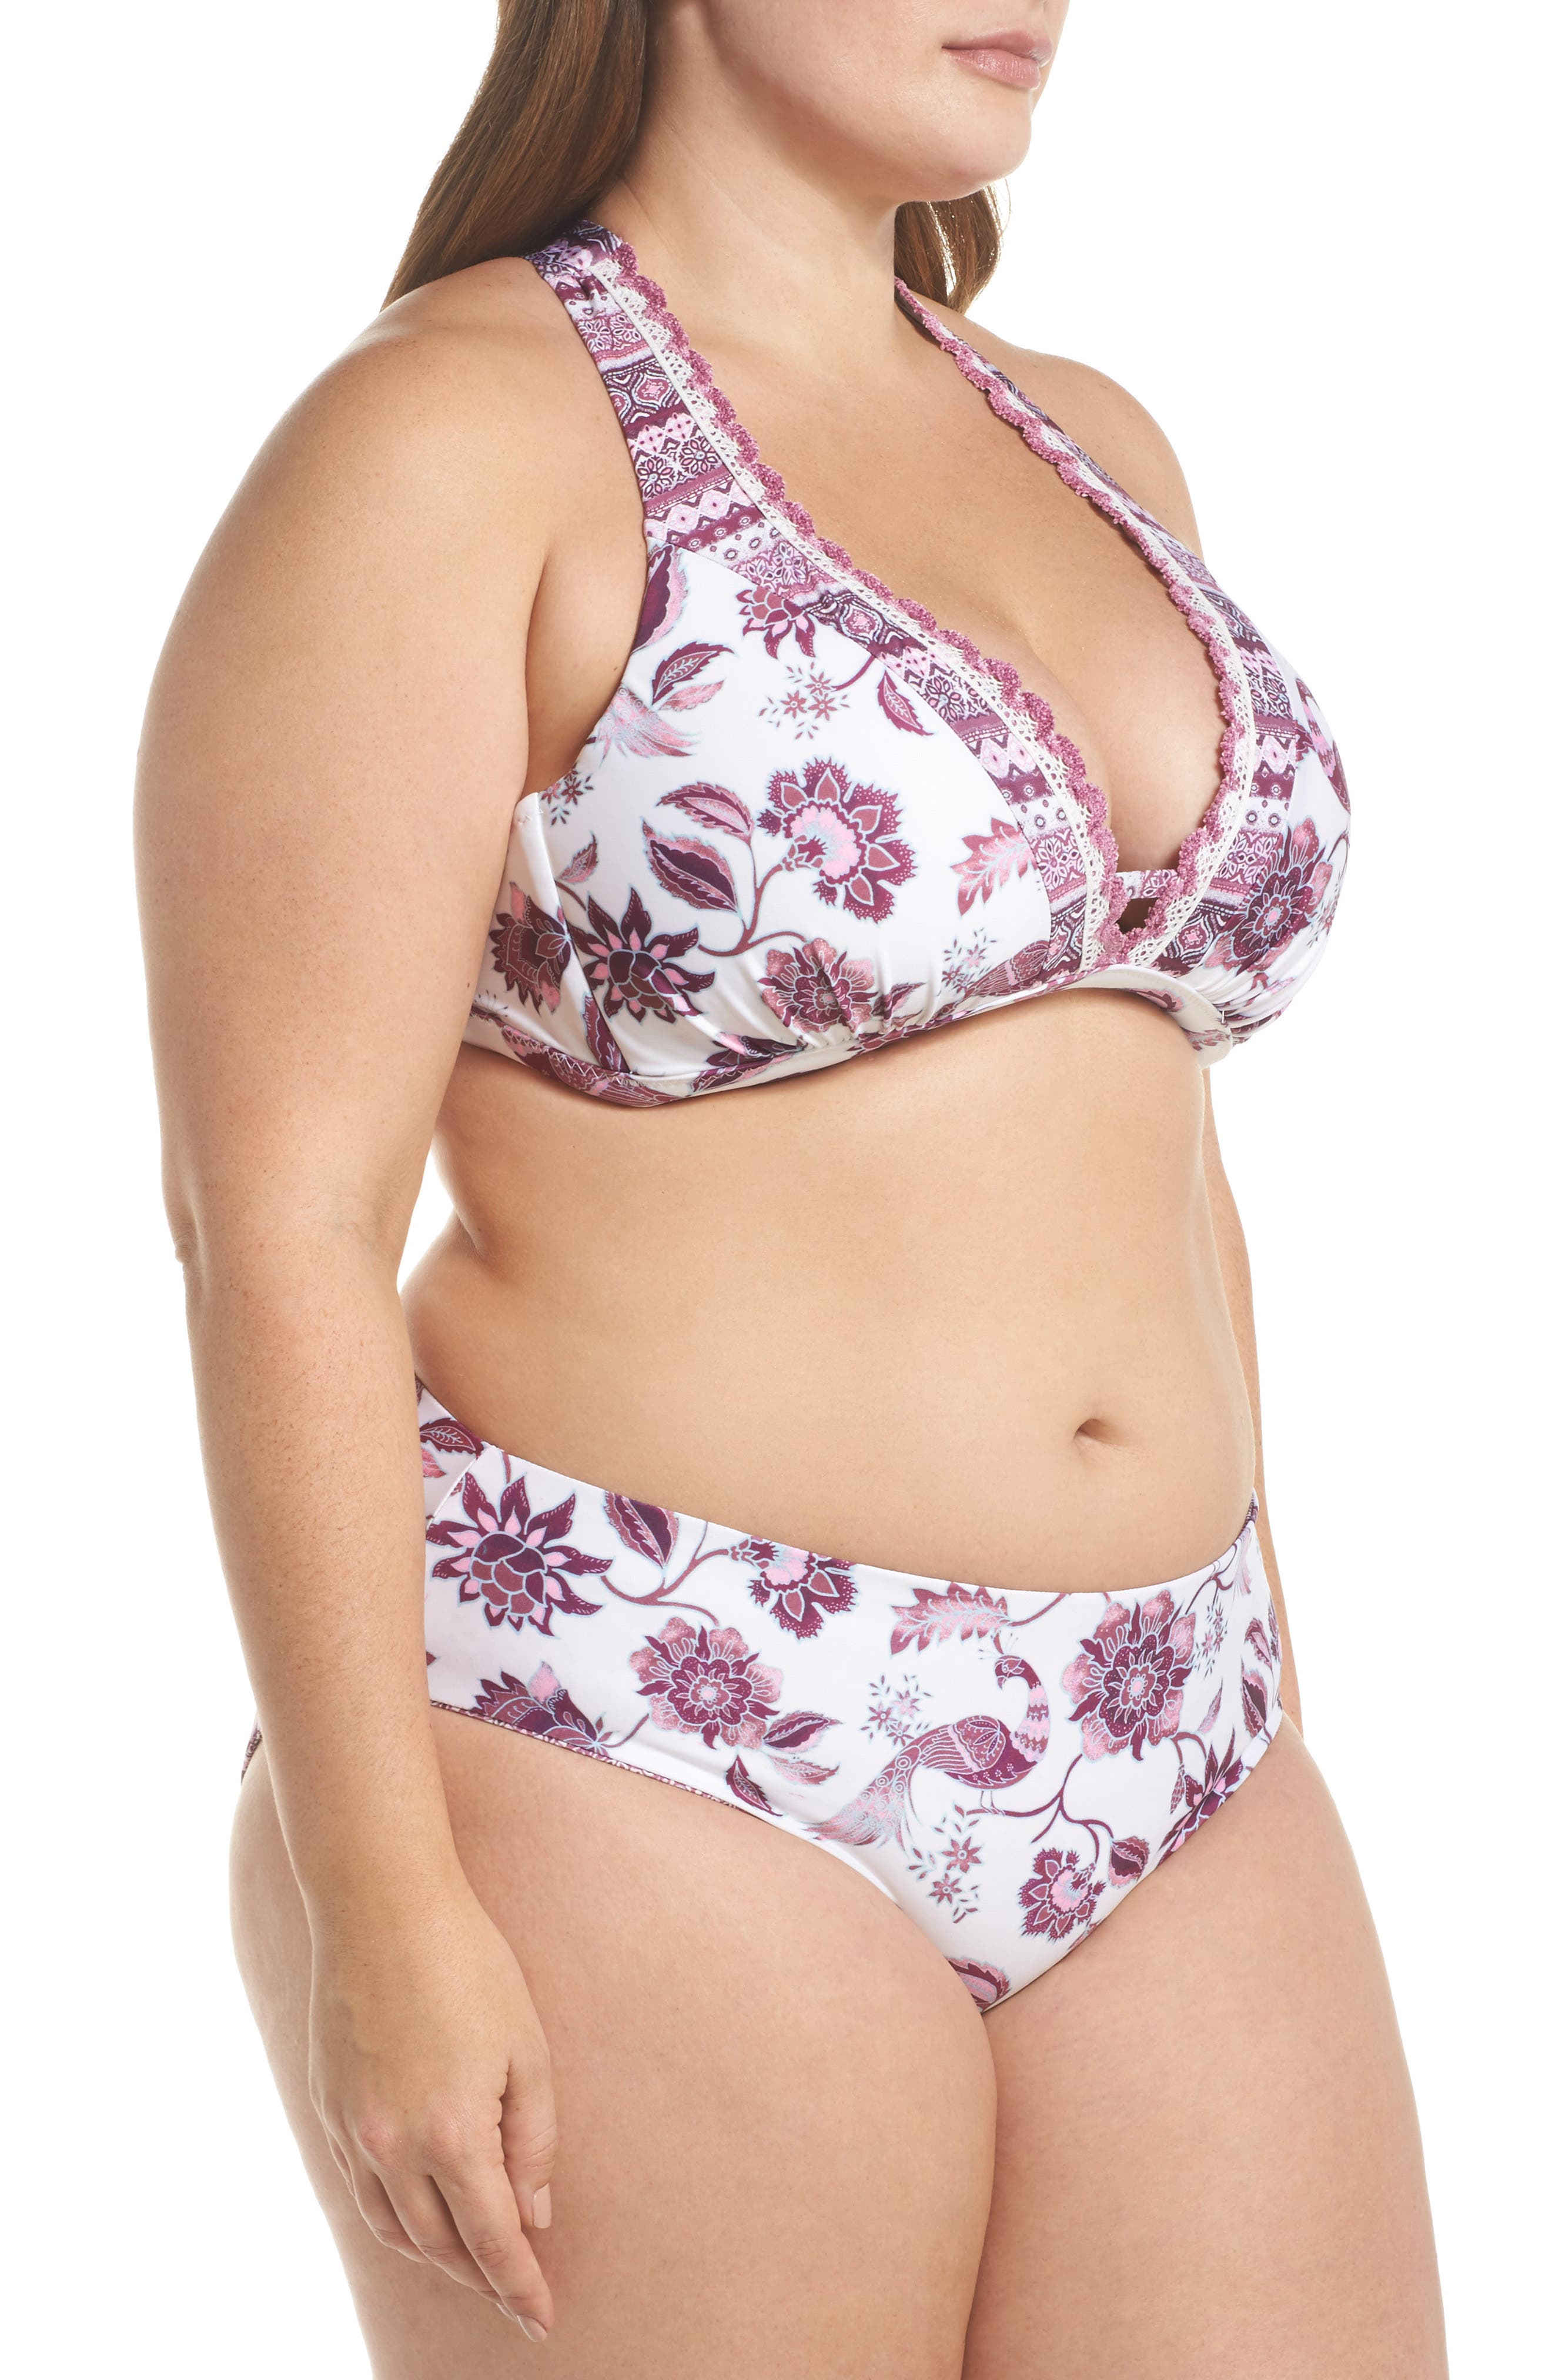 Tahiti Halter Bikini Top,                             Alternate thumbnail 7, color,                             Purple Multi